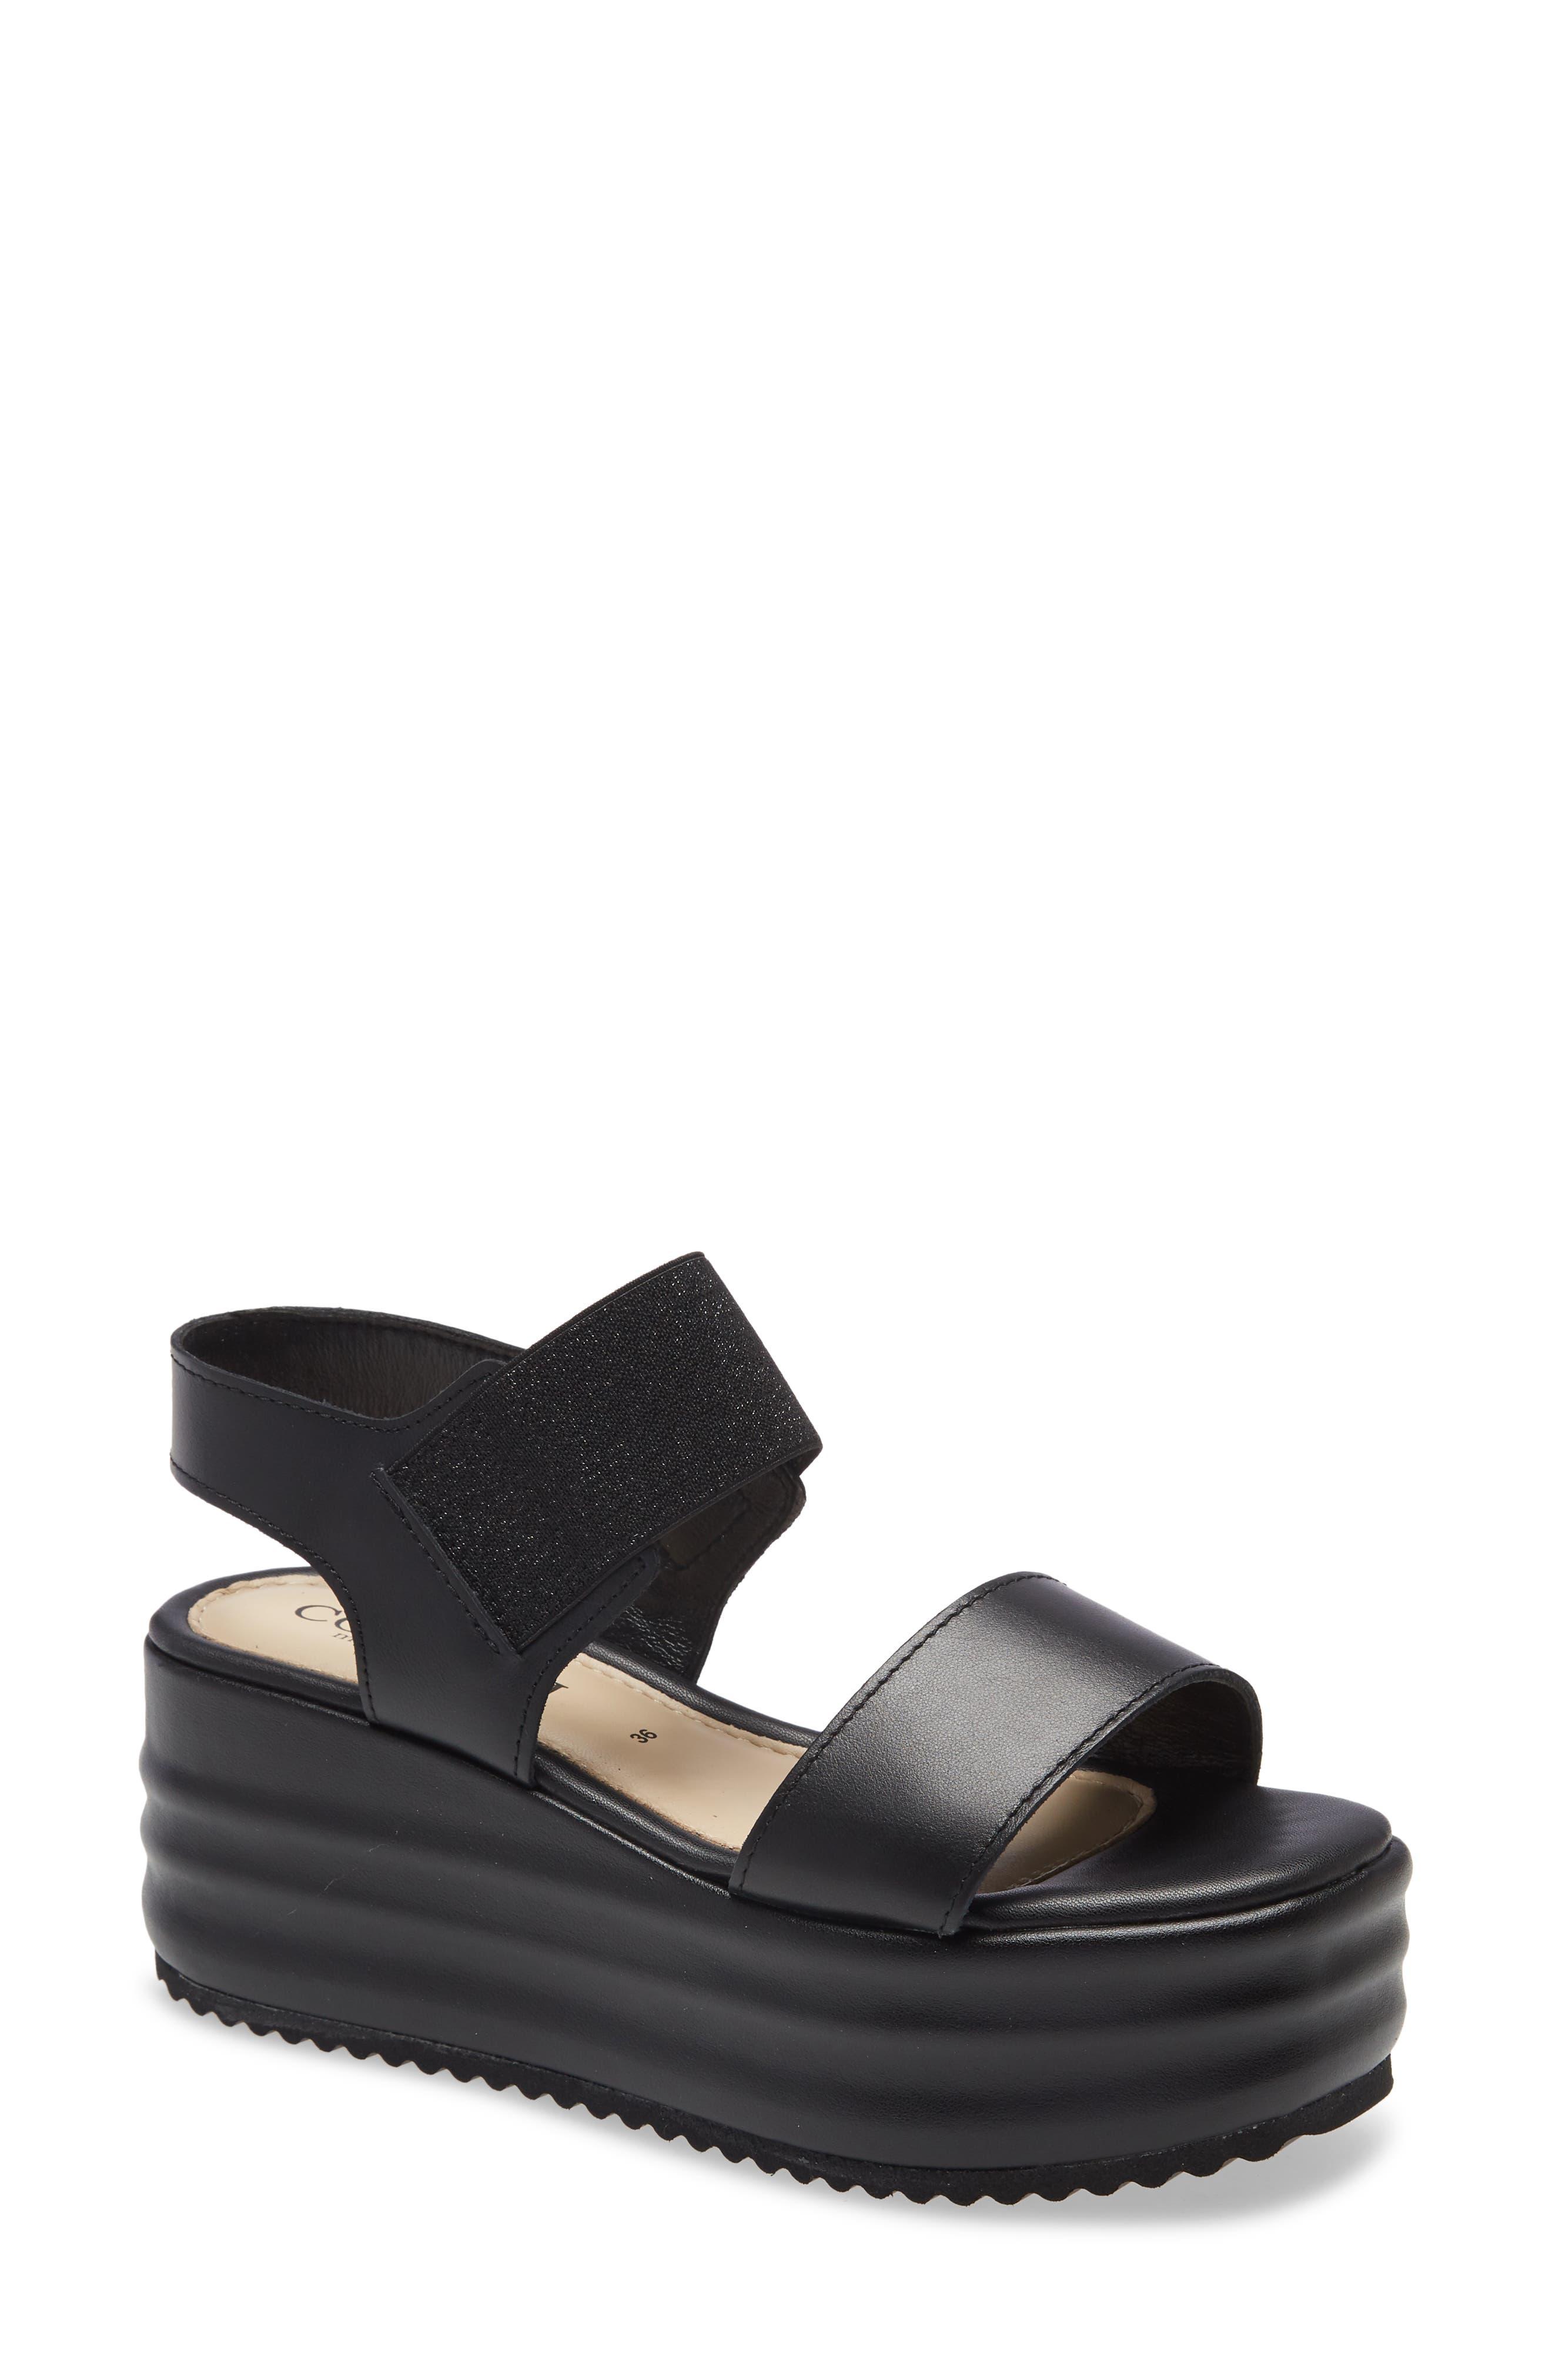 Yield Platform Sandal